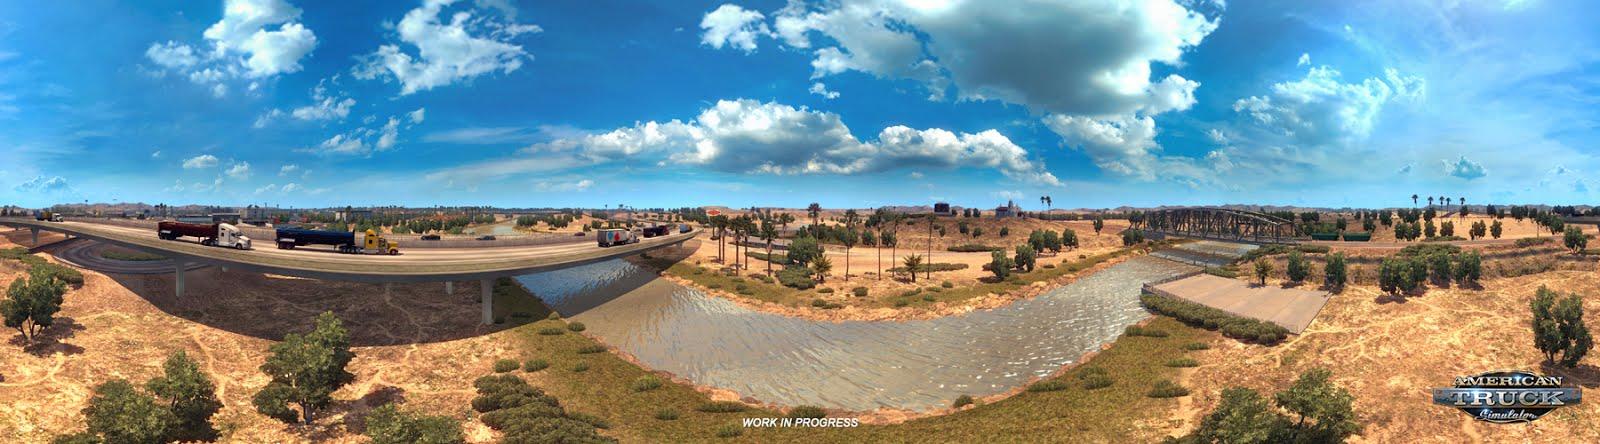 ATS-20160513_03 - Colorado River near Yuma.jpg